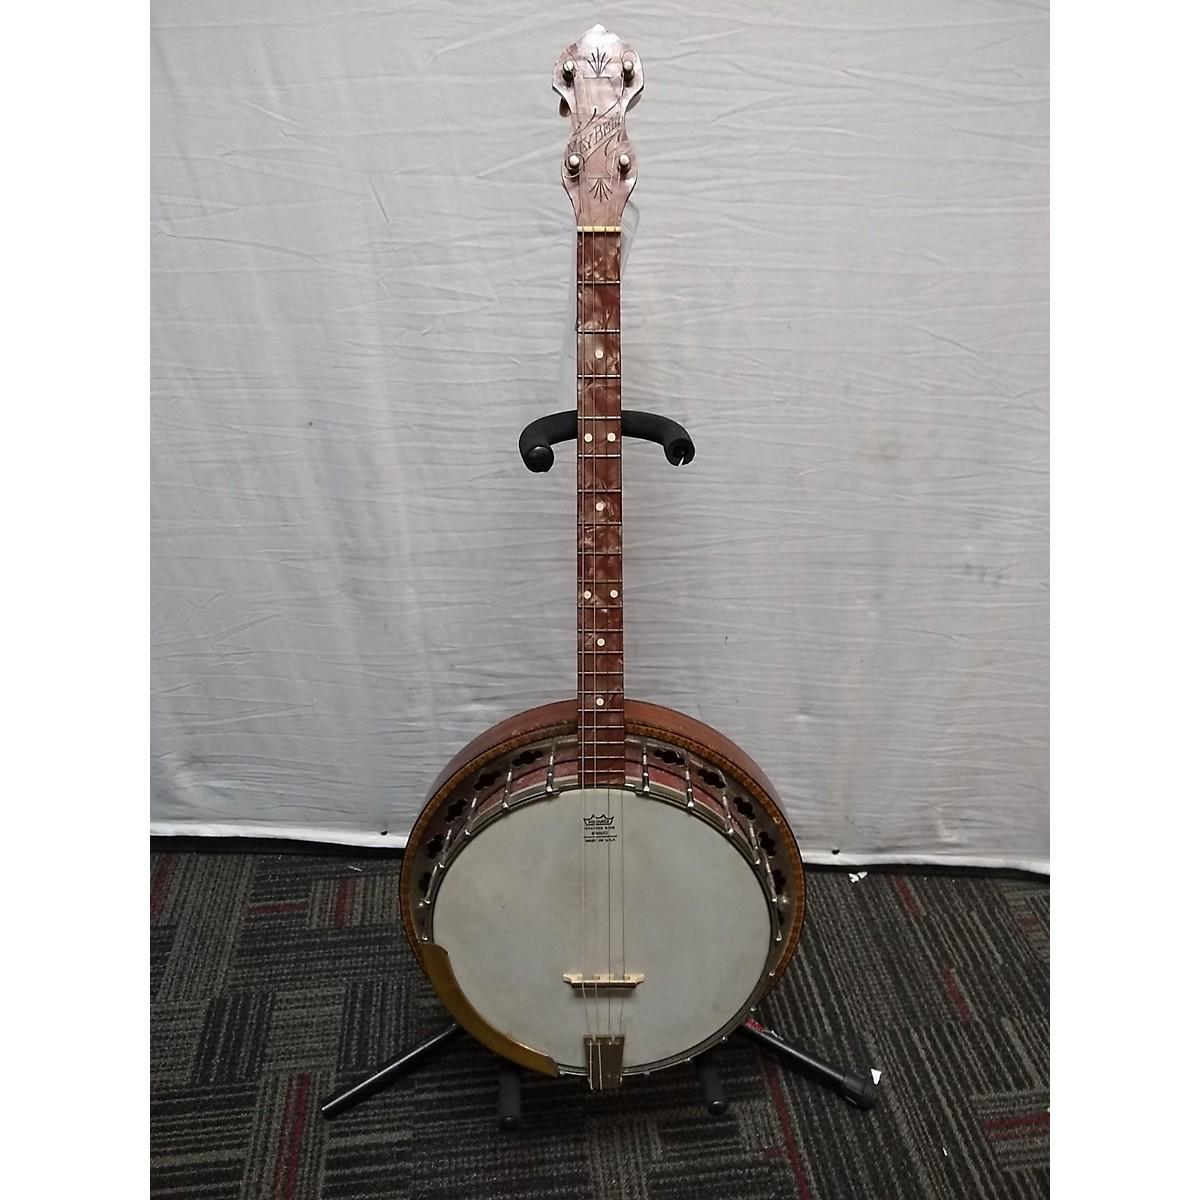 Slingerland 1930 MAY BELL Banjo